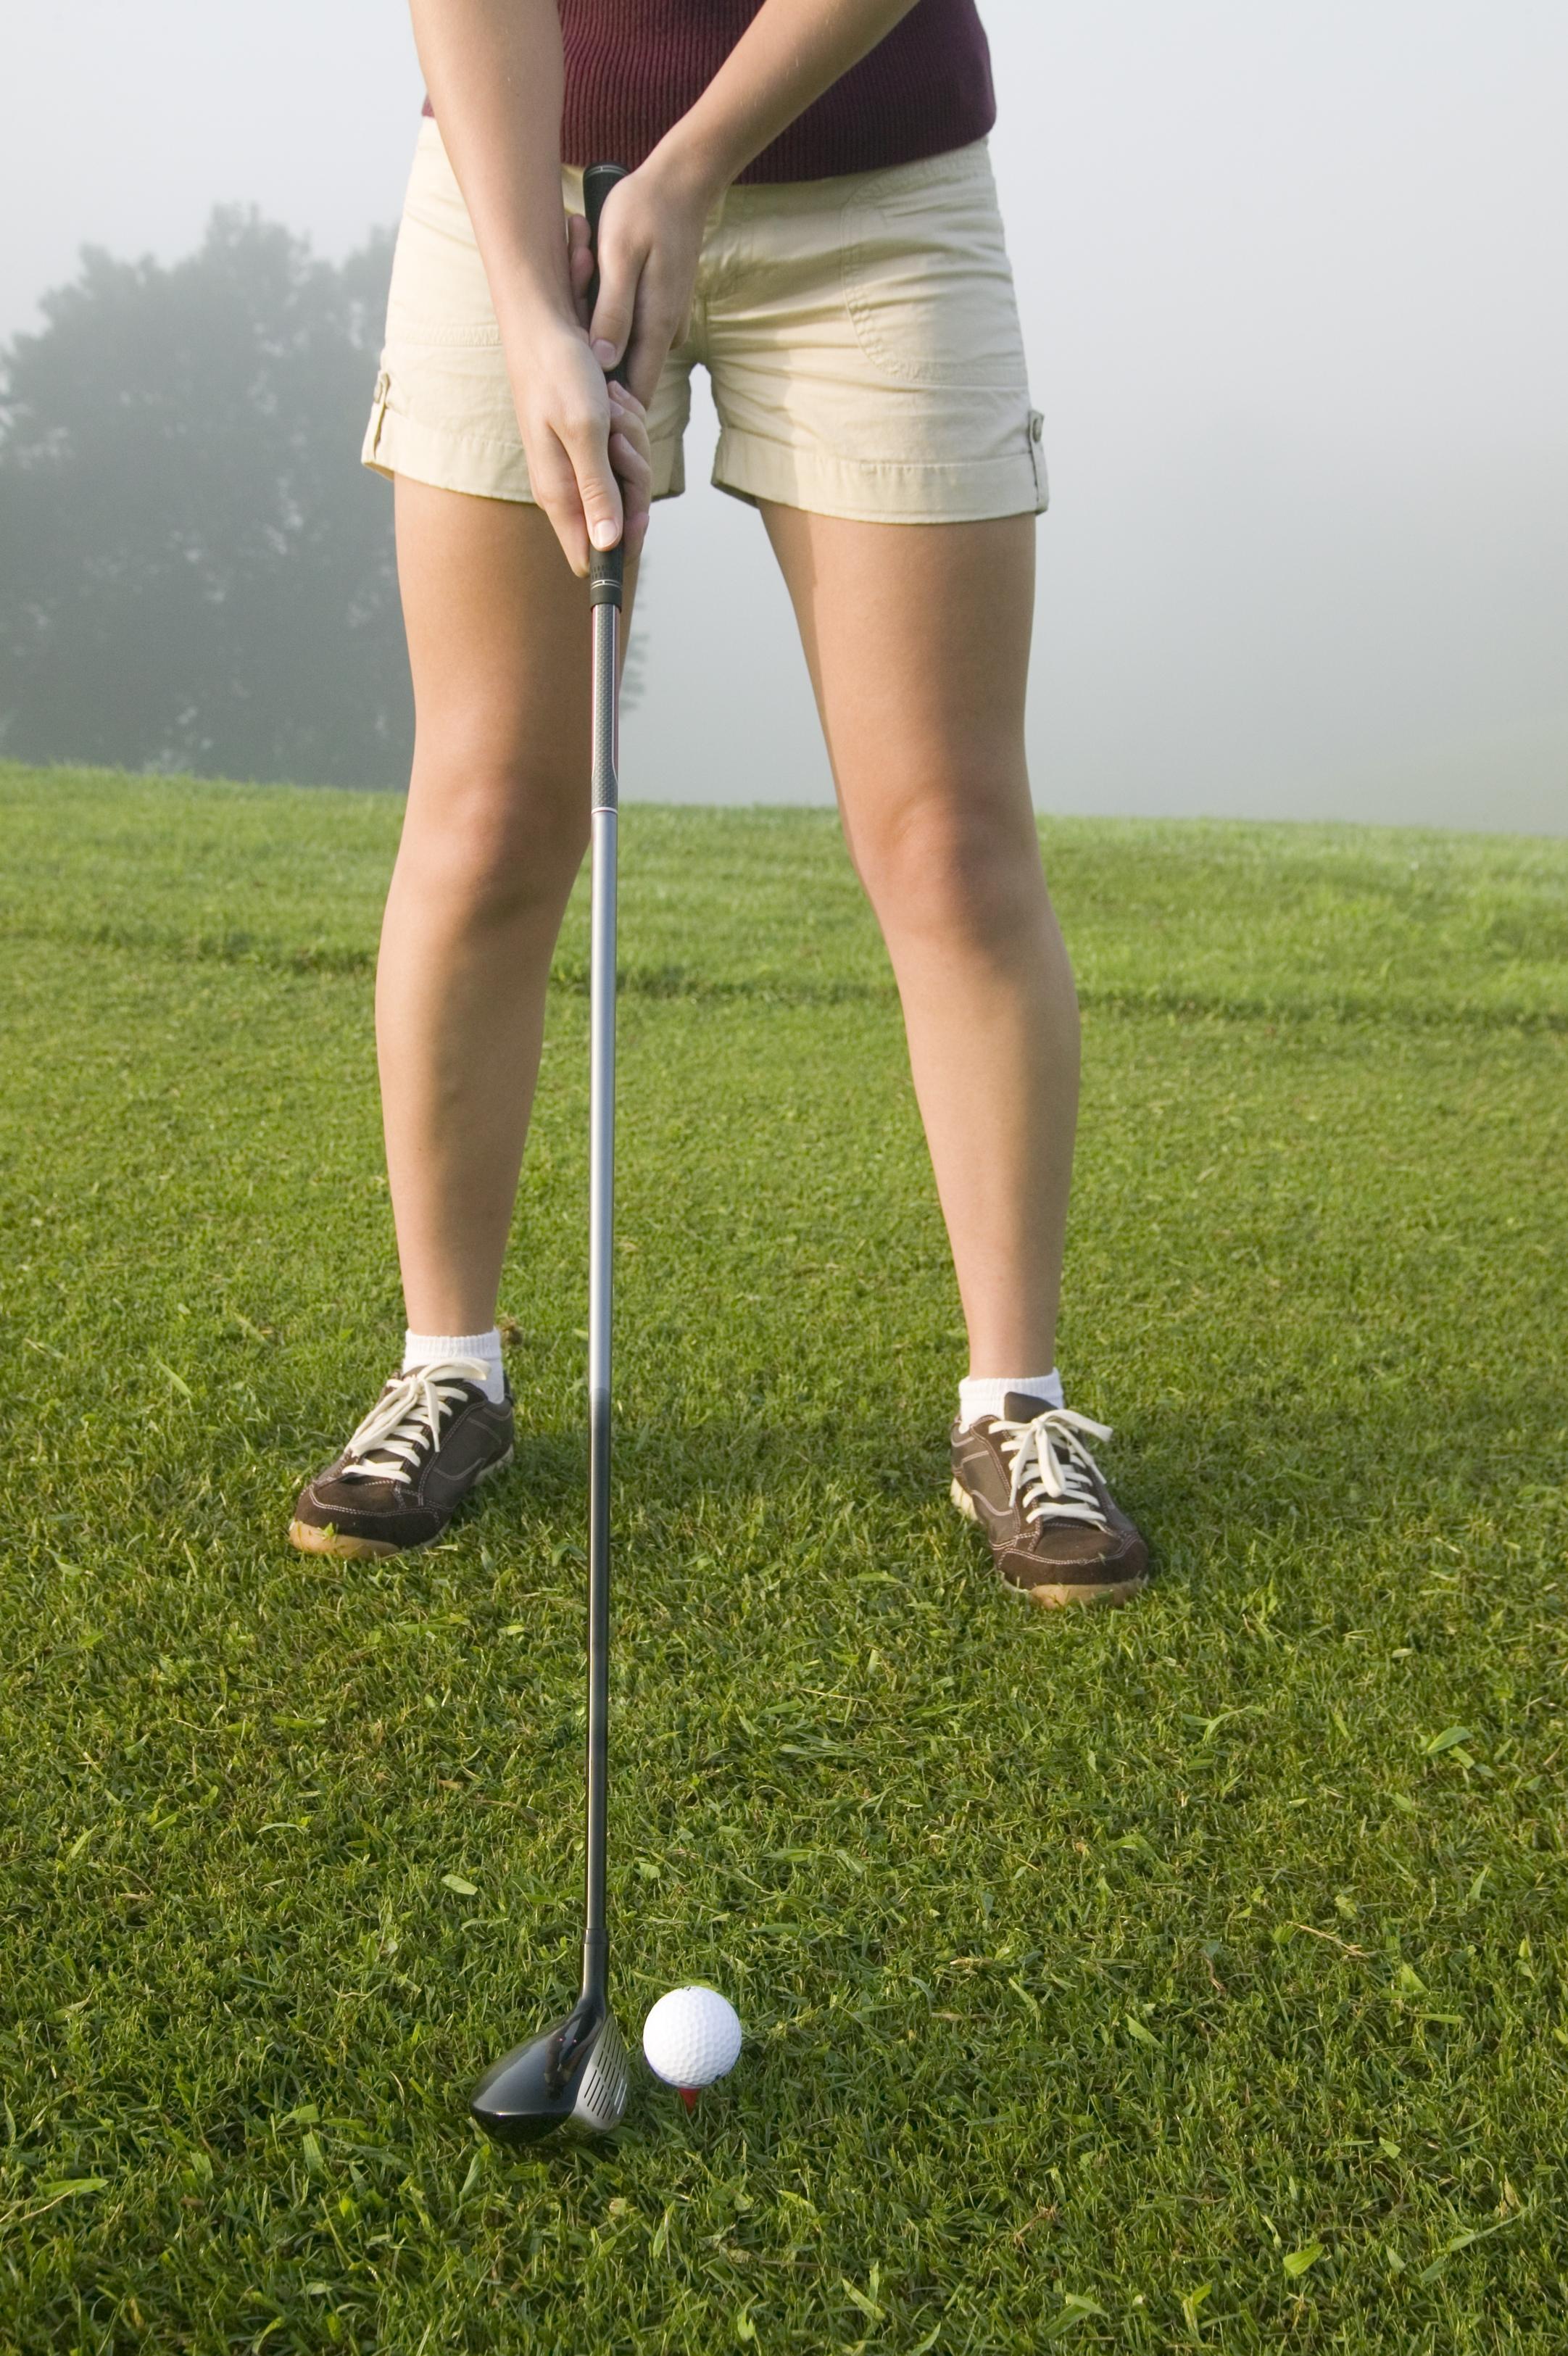 Improving Golf Swing Improving Golf Posure Golf Injuries